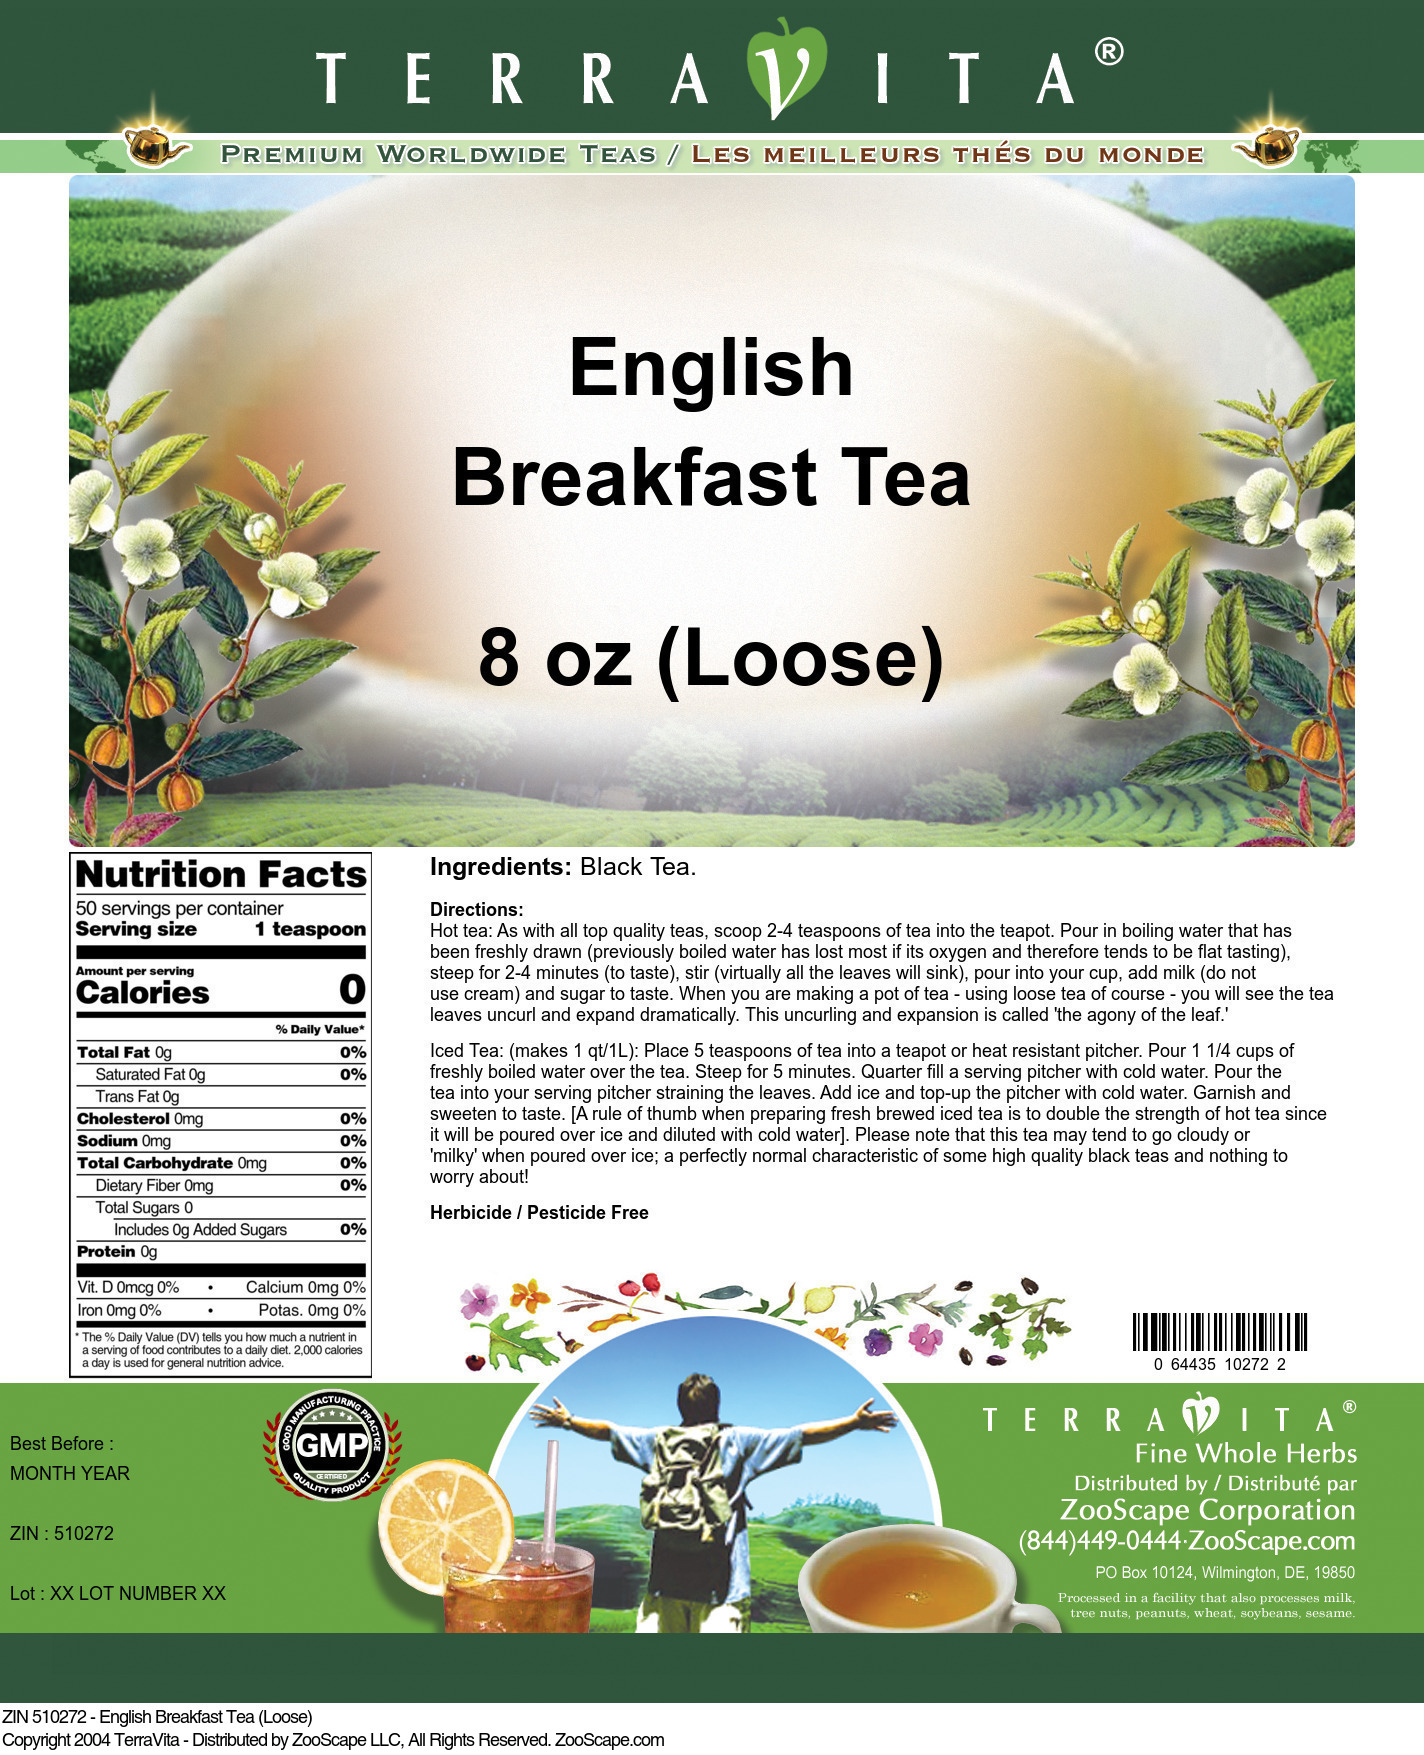 English Breakfast Tea (Loose)